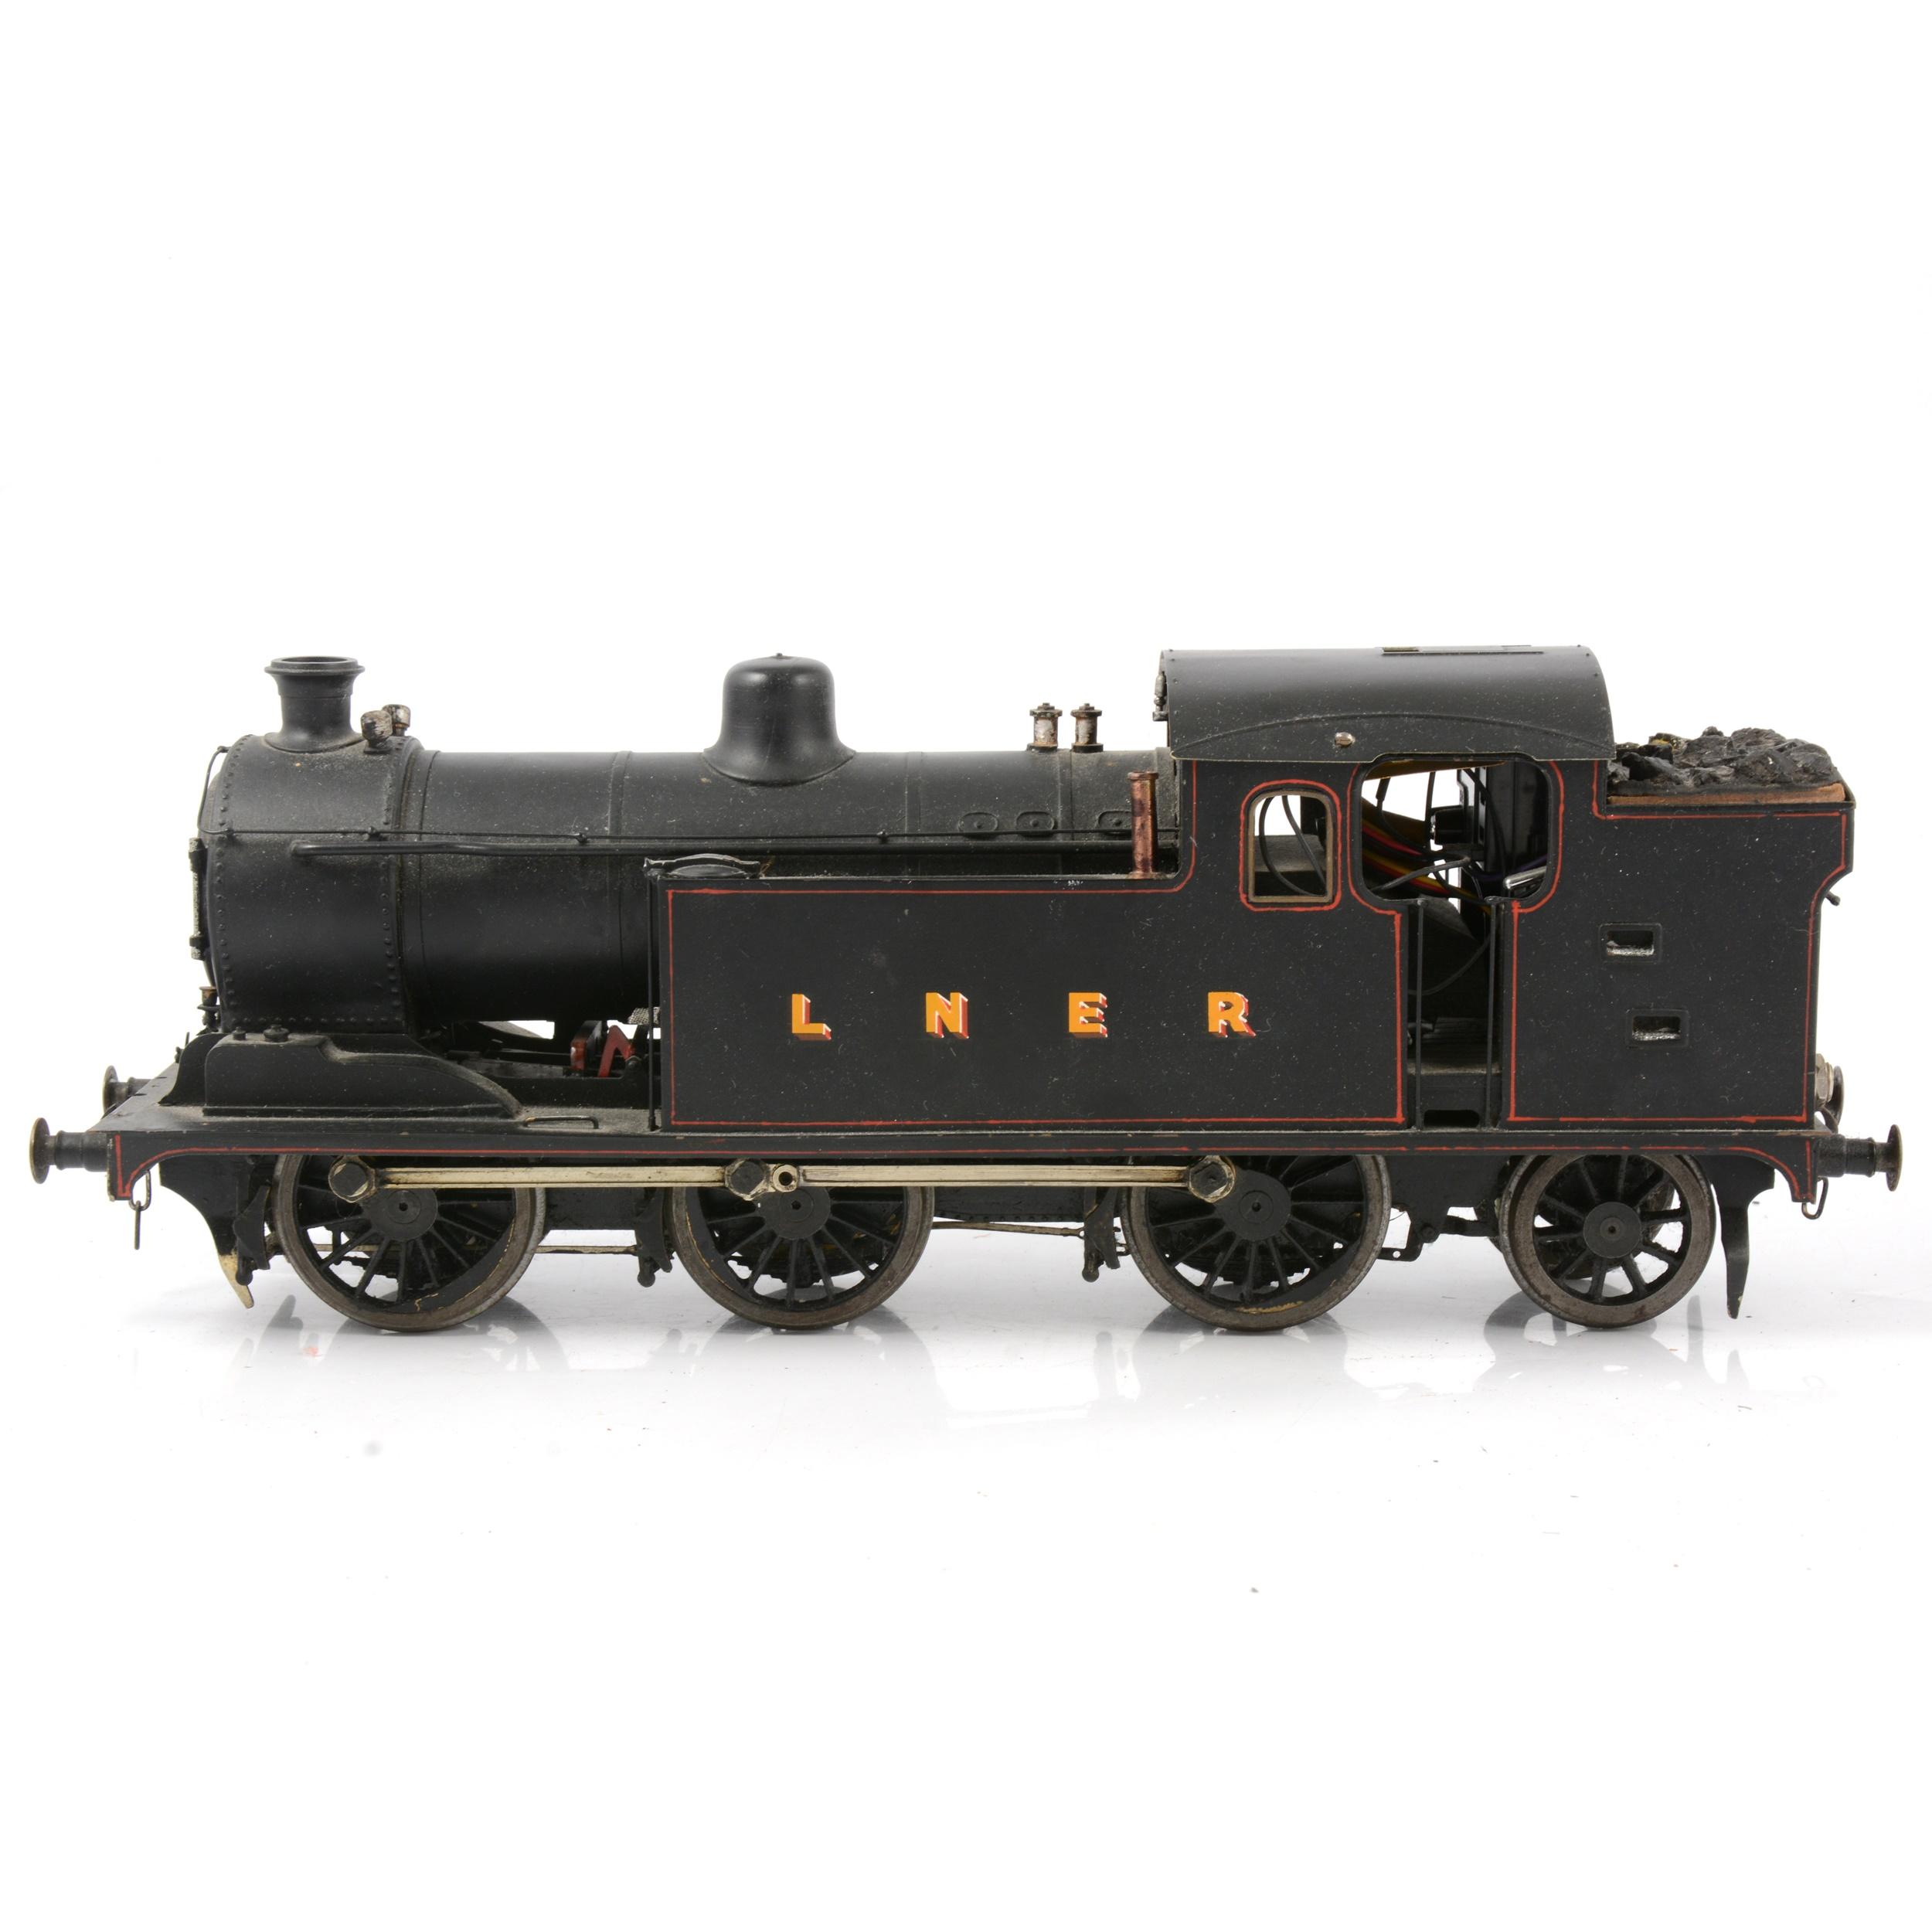 A well-built electric gauge 1 / G scale, 45mm locomotive, LNER 0-6-2 tank engine - Image 4 of 4